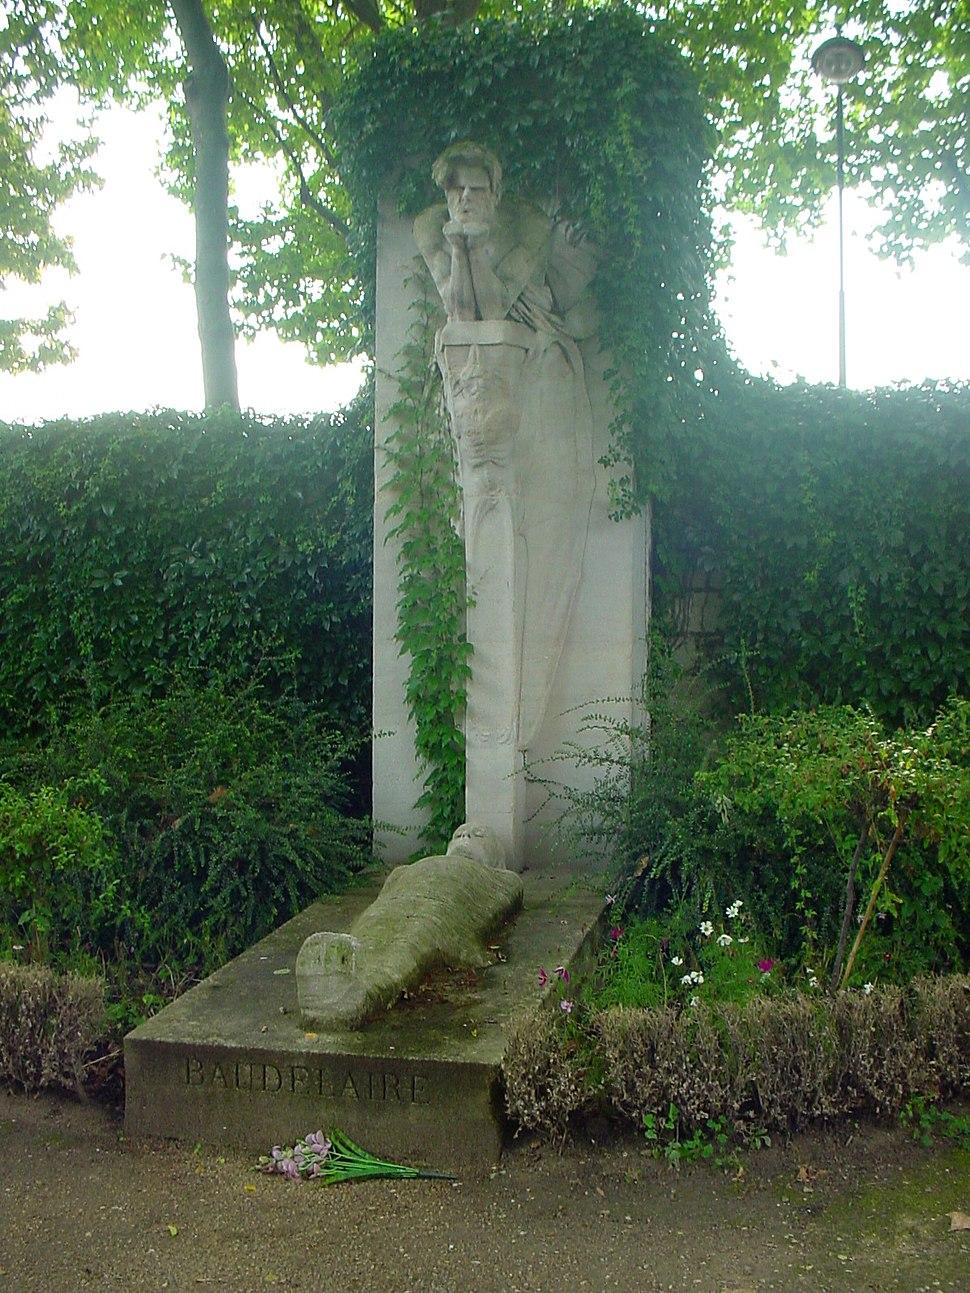 Charles Baudelaire tomb in Montparnasse Cemetery